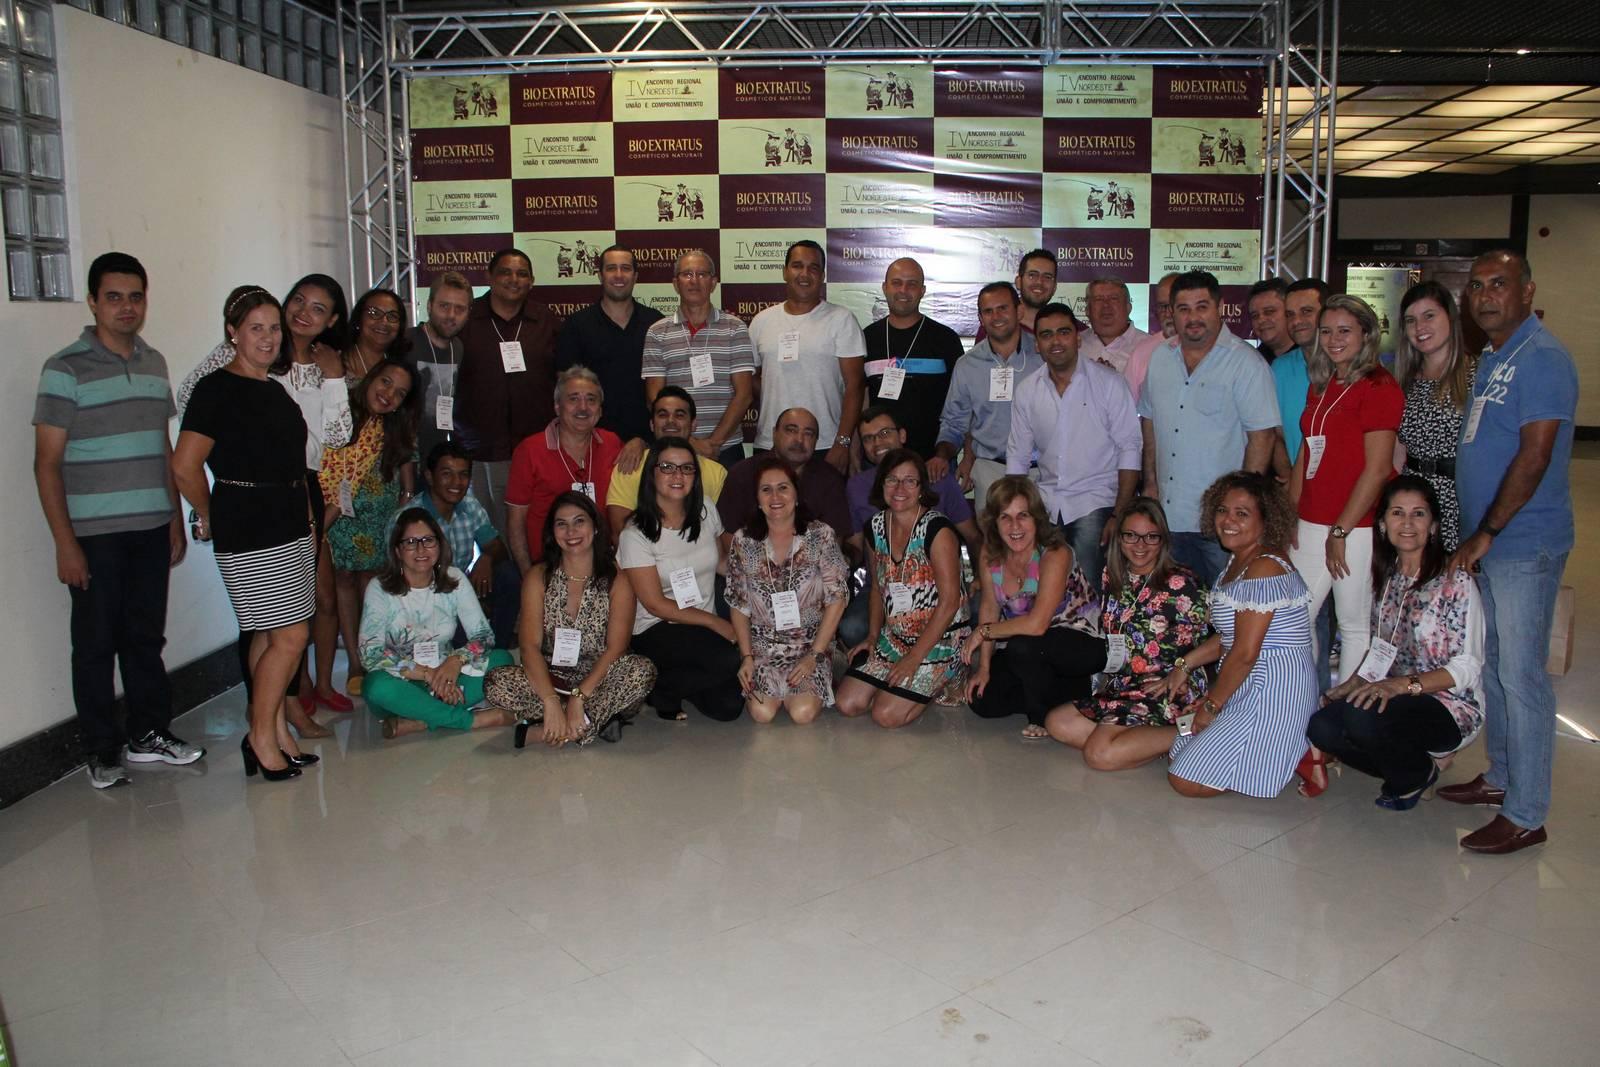 IV Encontro Regional do Nordeste - Bio Extratus (276)